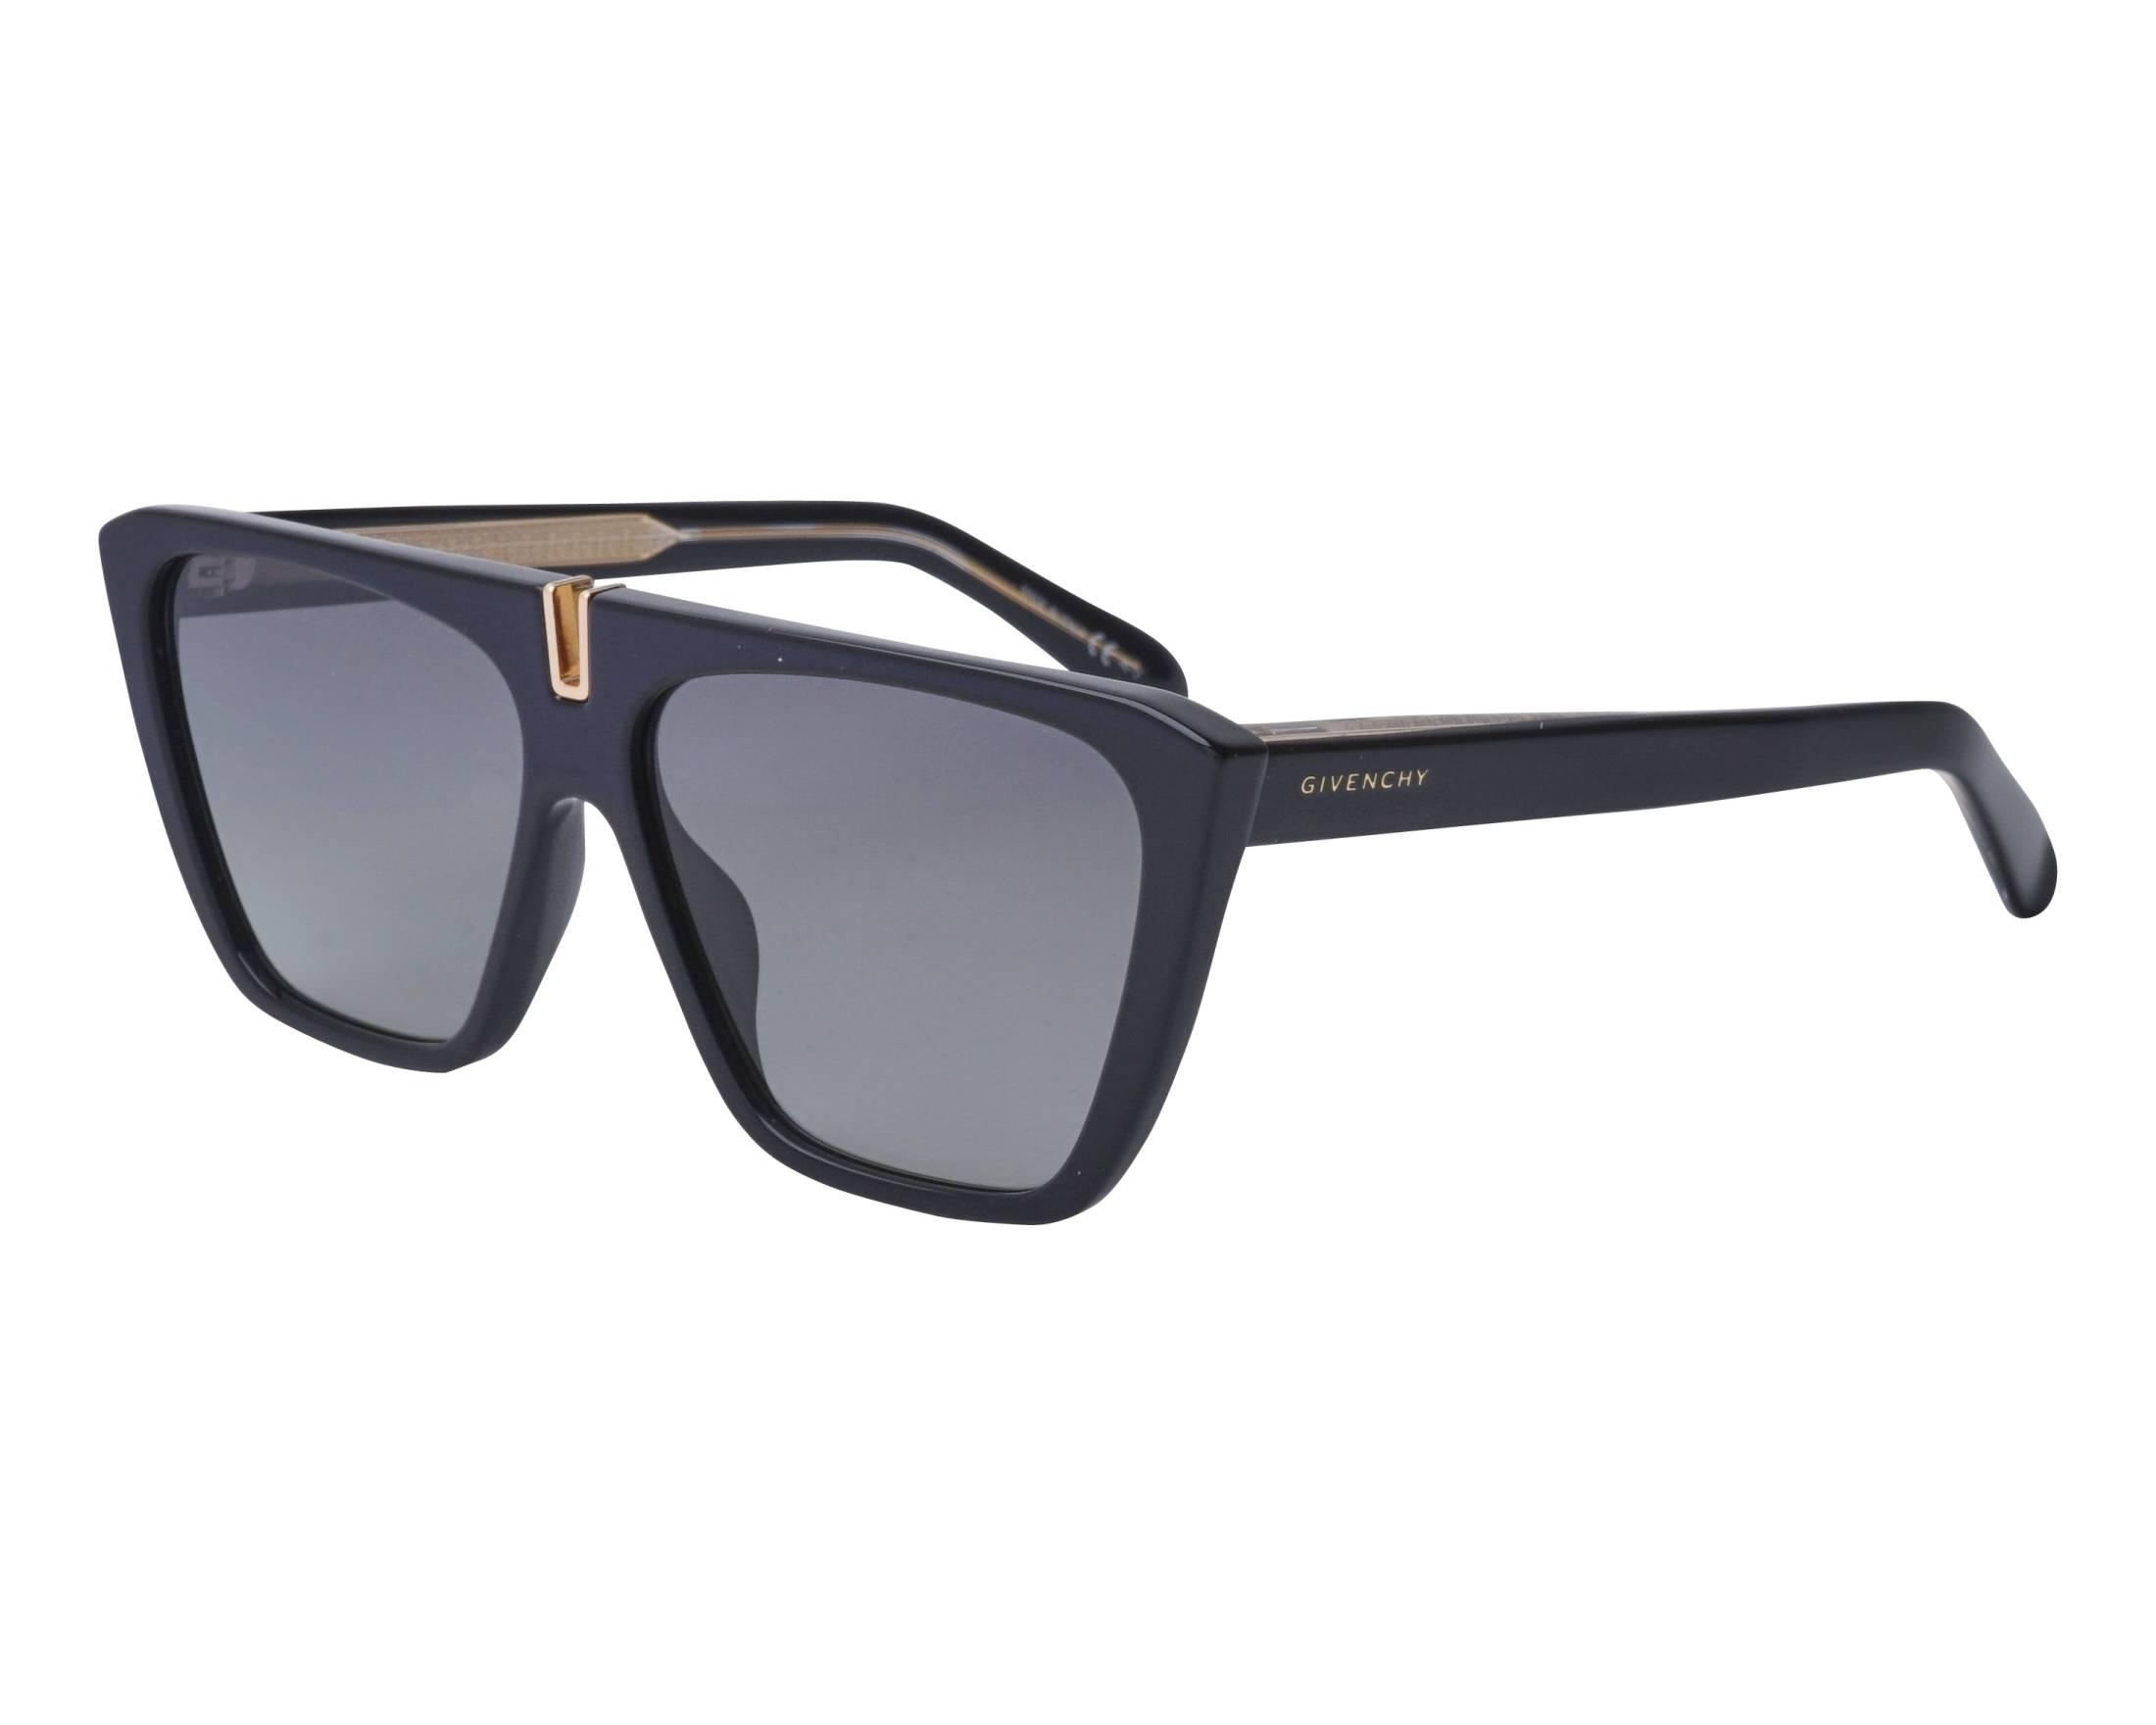 Givenchy Givenchy 7109/S Sunglasses - Givenchy Authorized